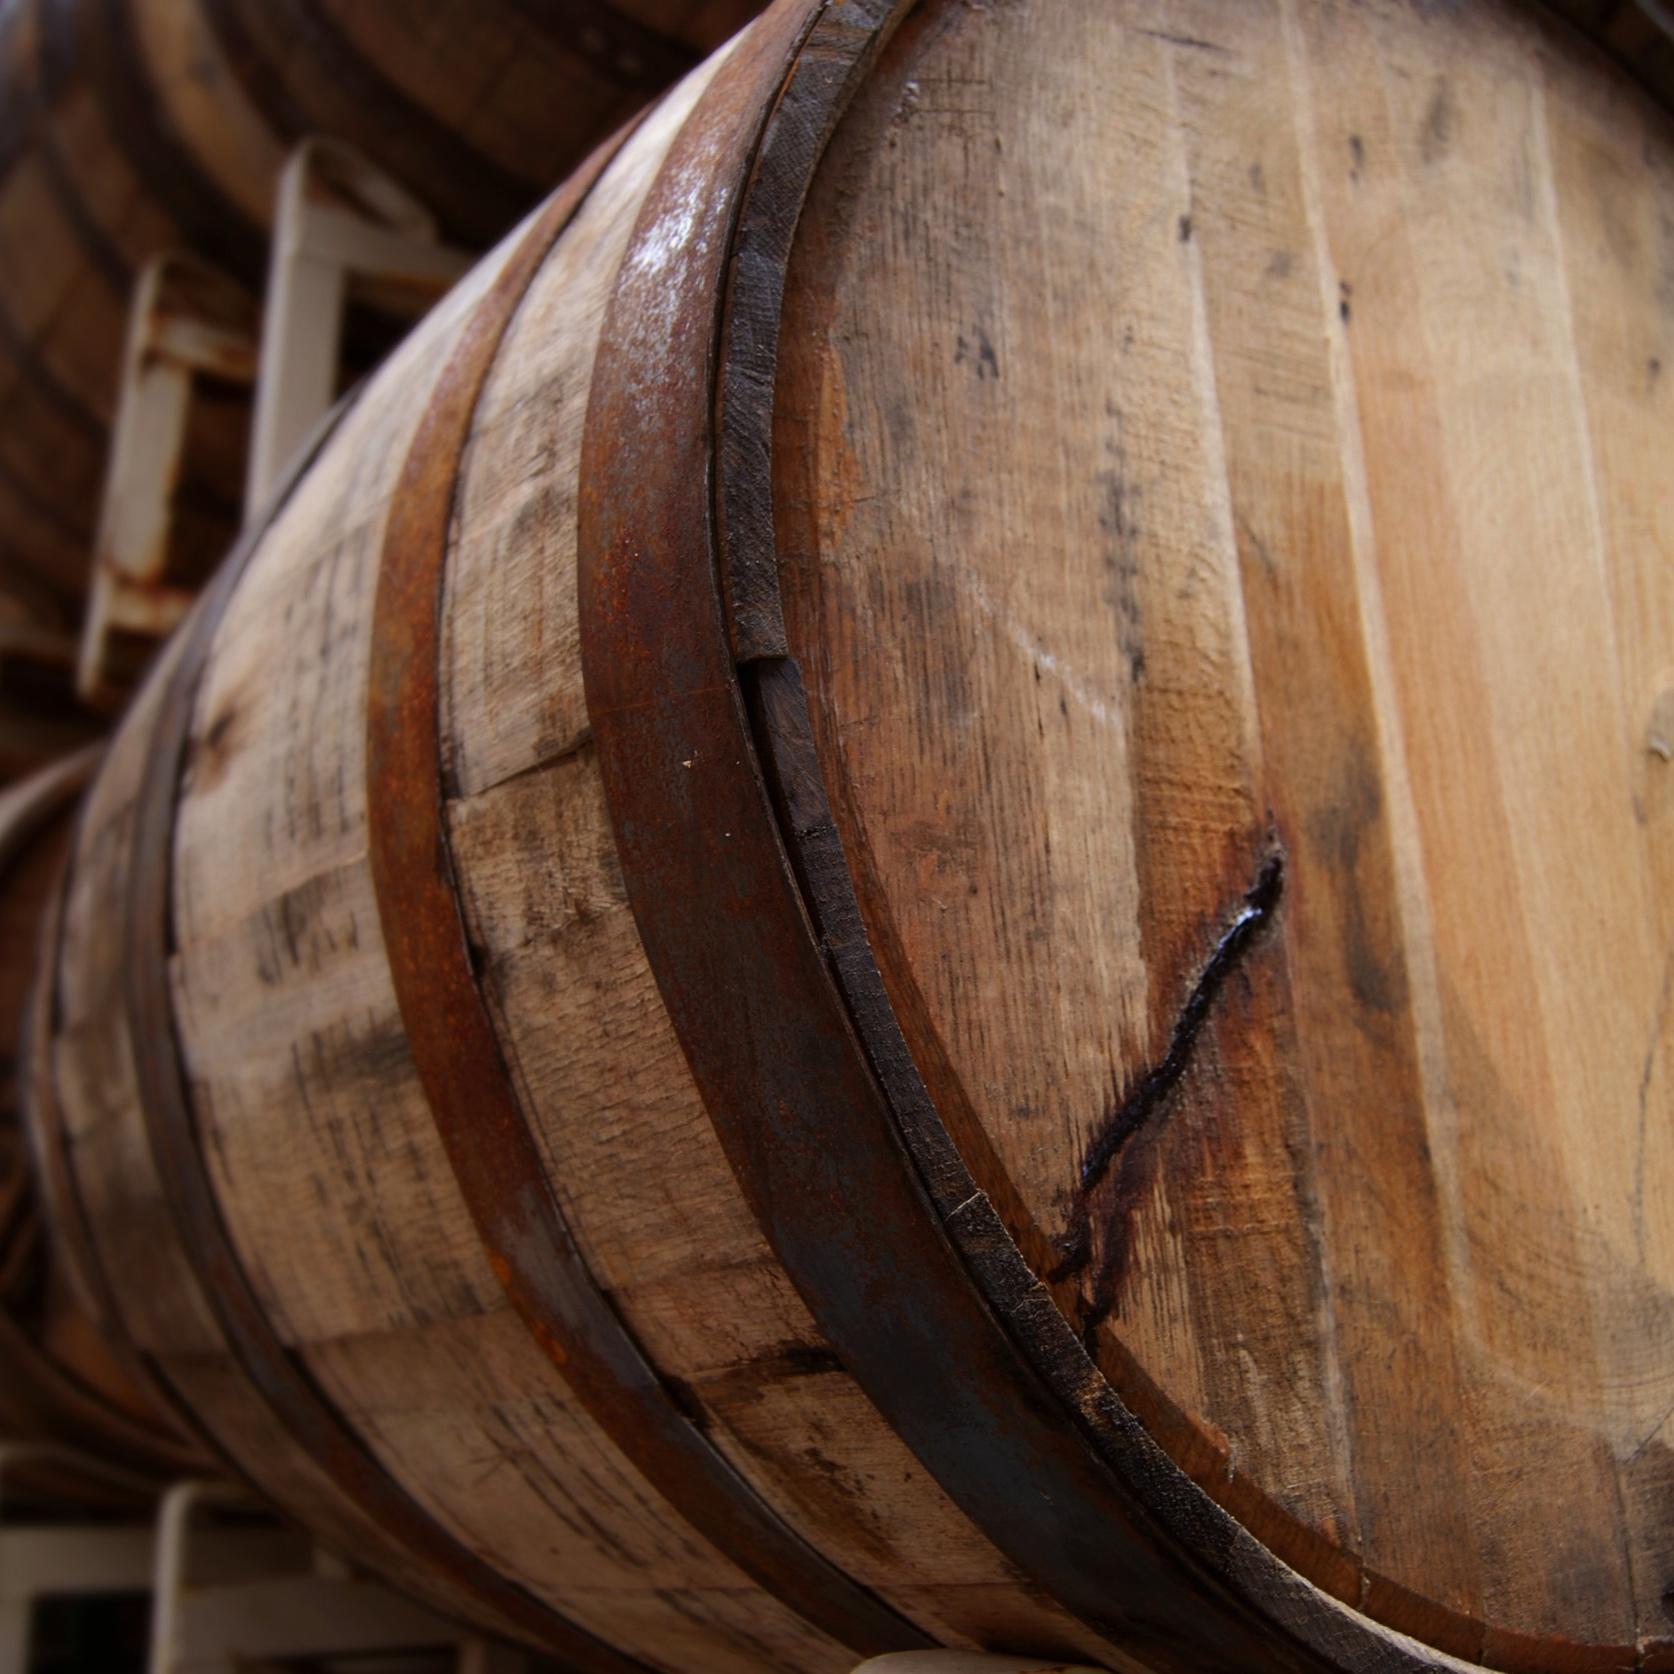 Image of oak fermenting barrel.